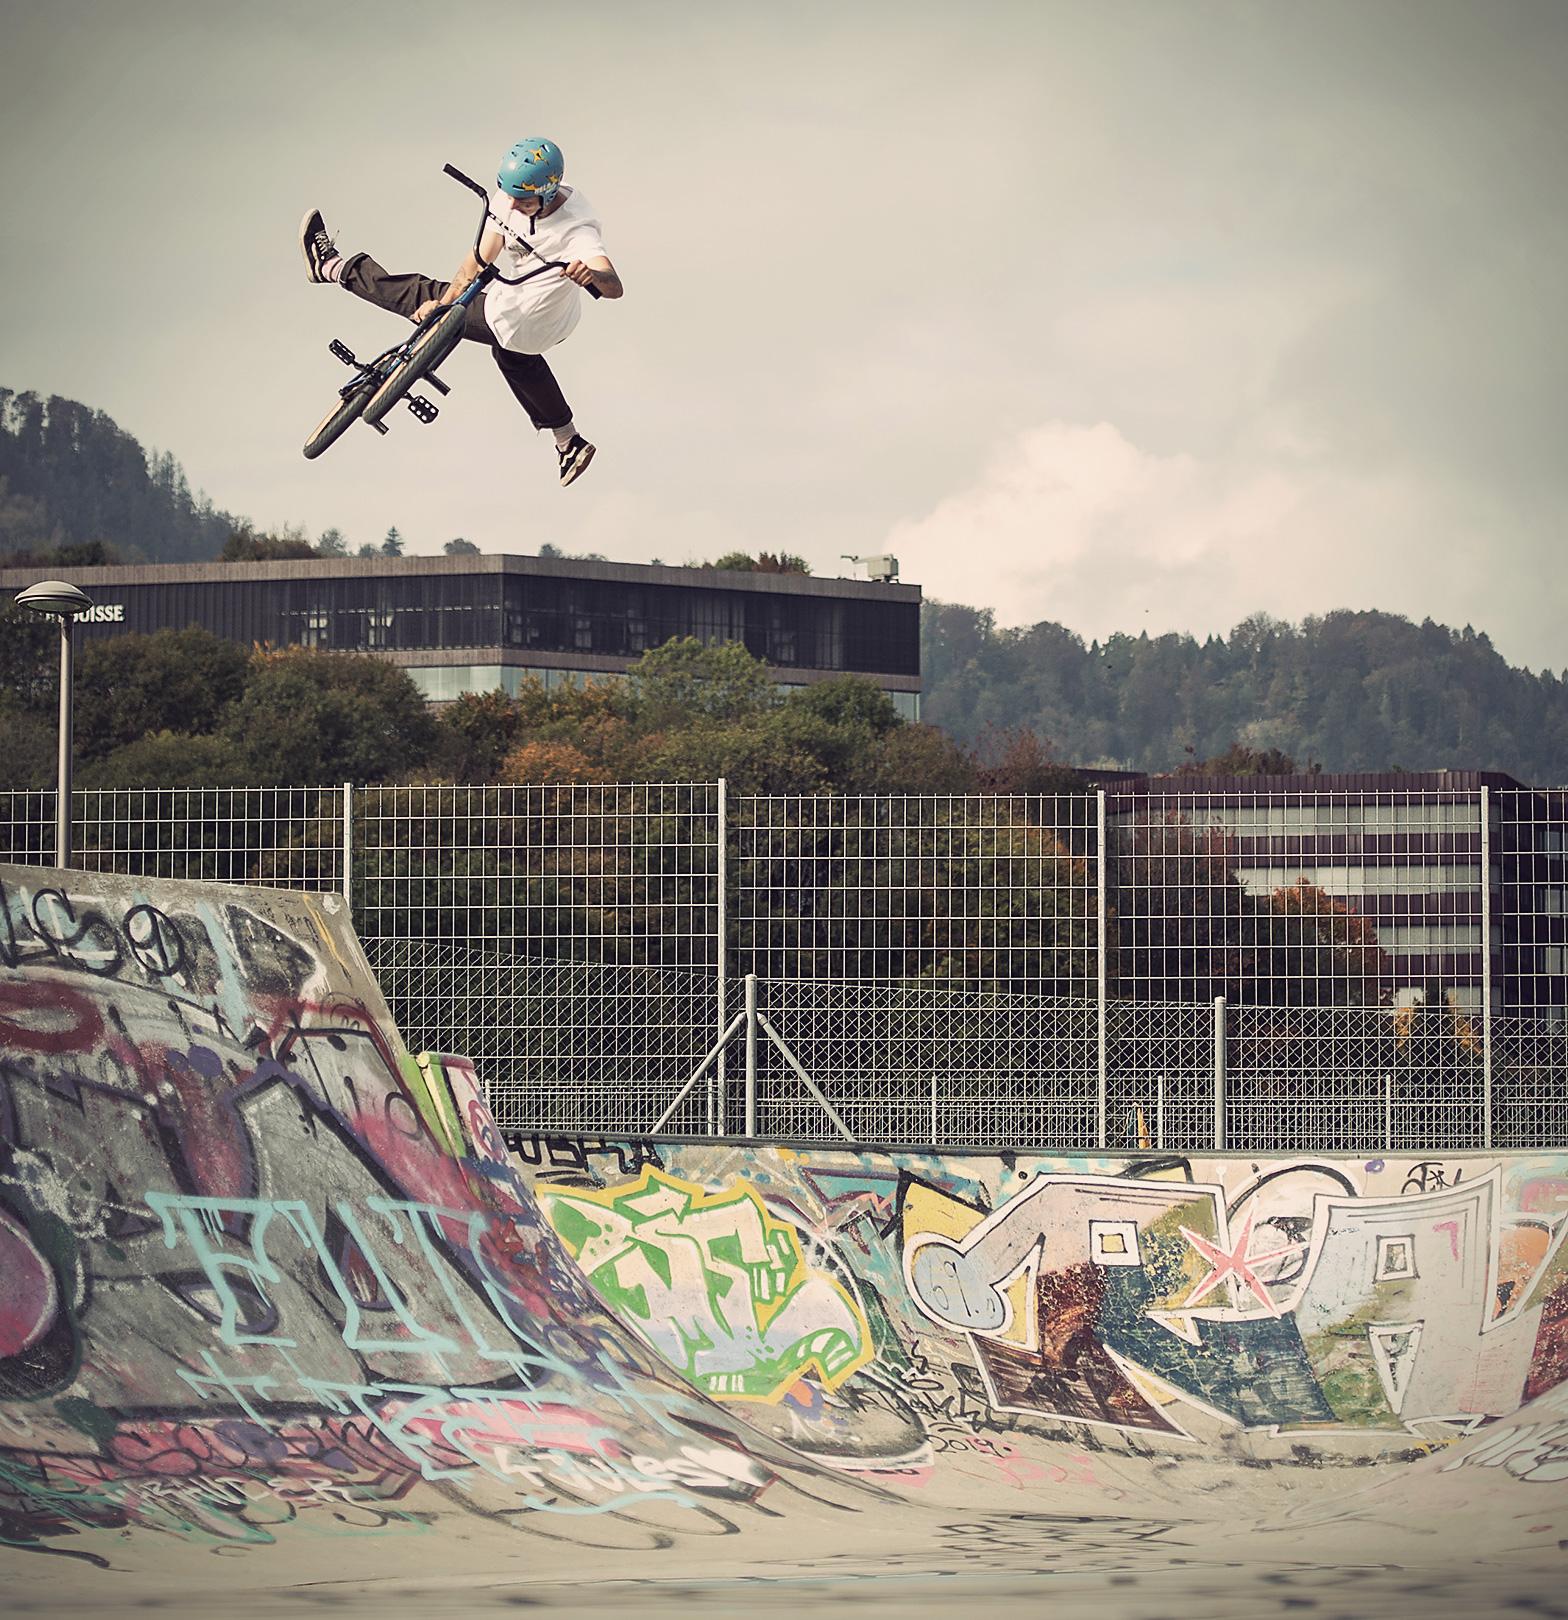 Indian Air by Alessio Tonoli in skatepark zurich